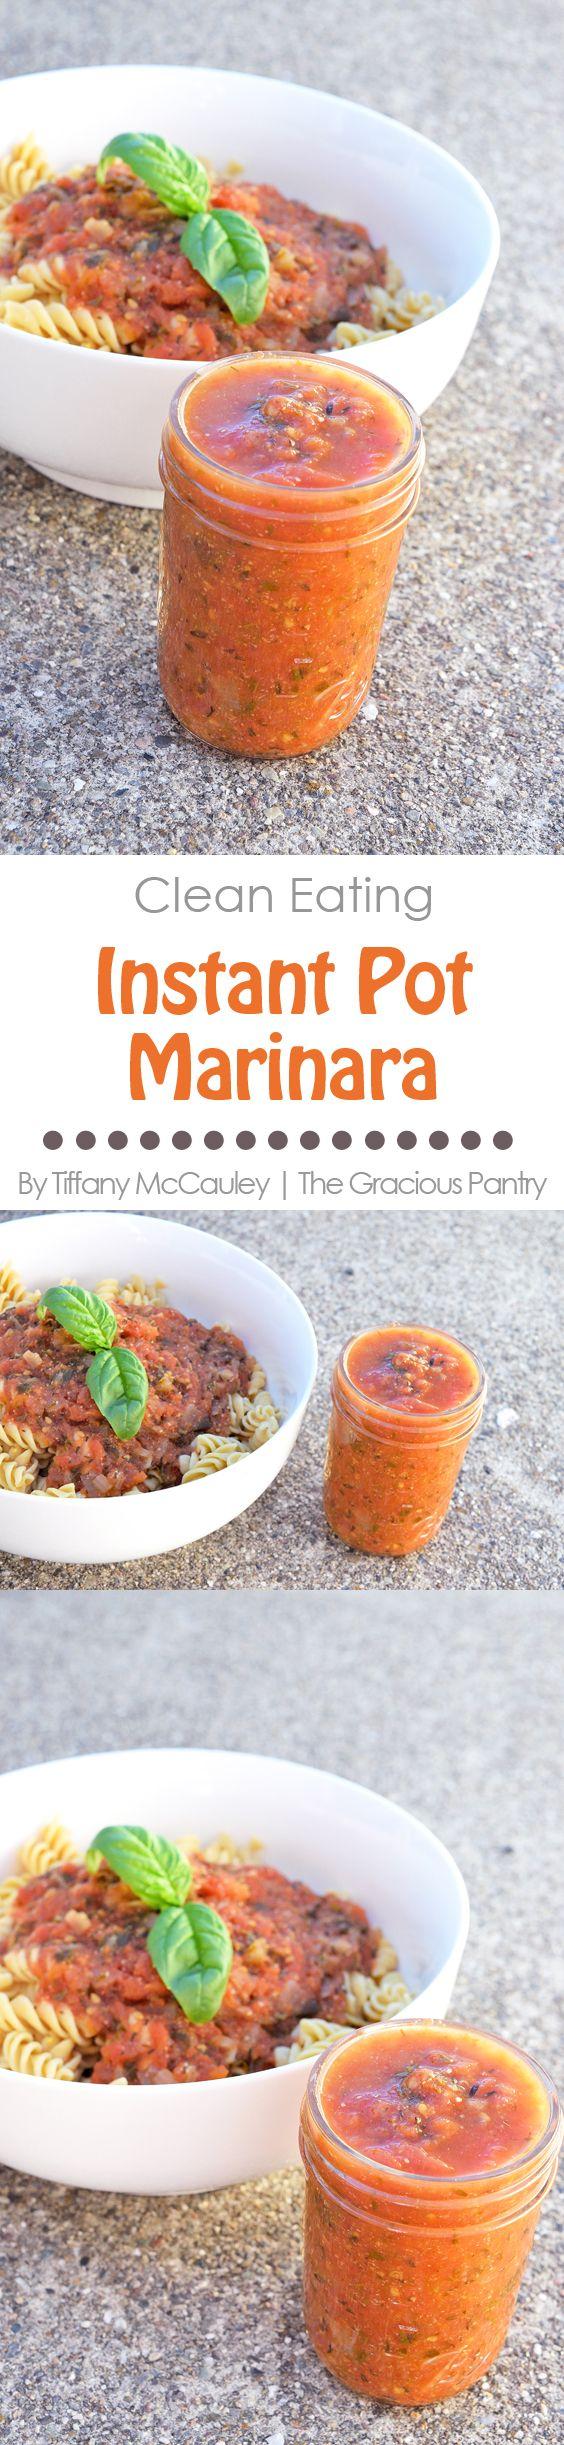 Clean Eating Instant Pot Marinara Recipe | The Gracious Pantry